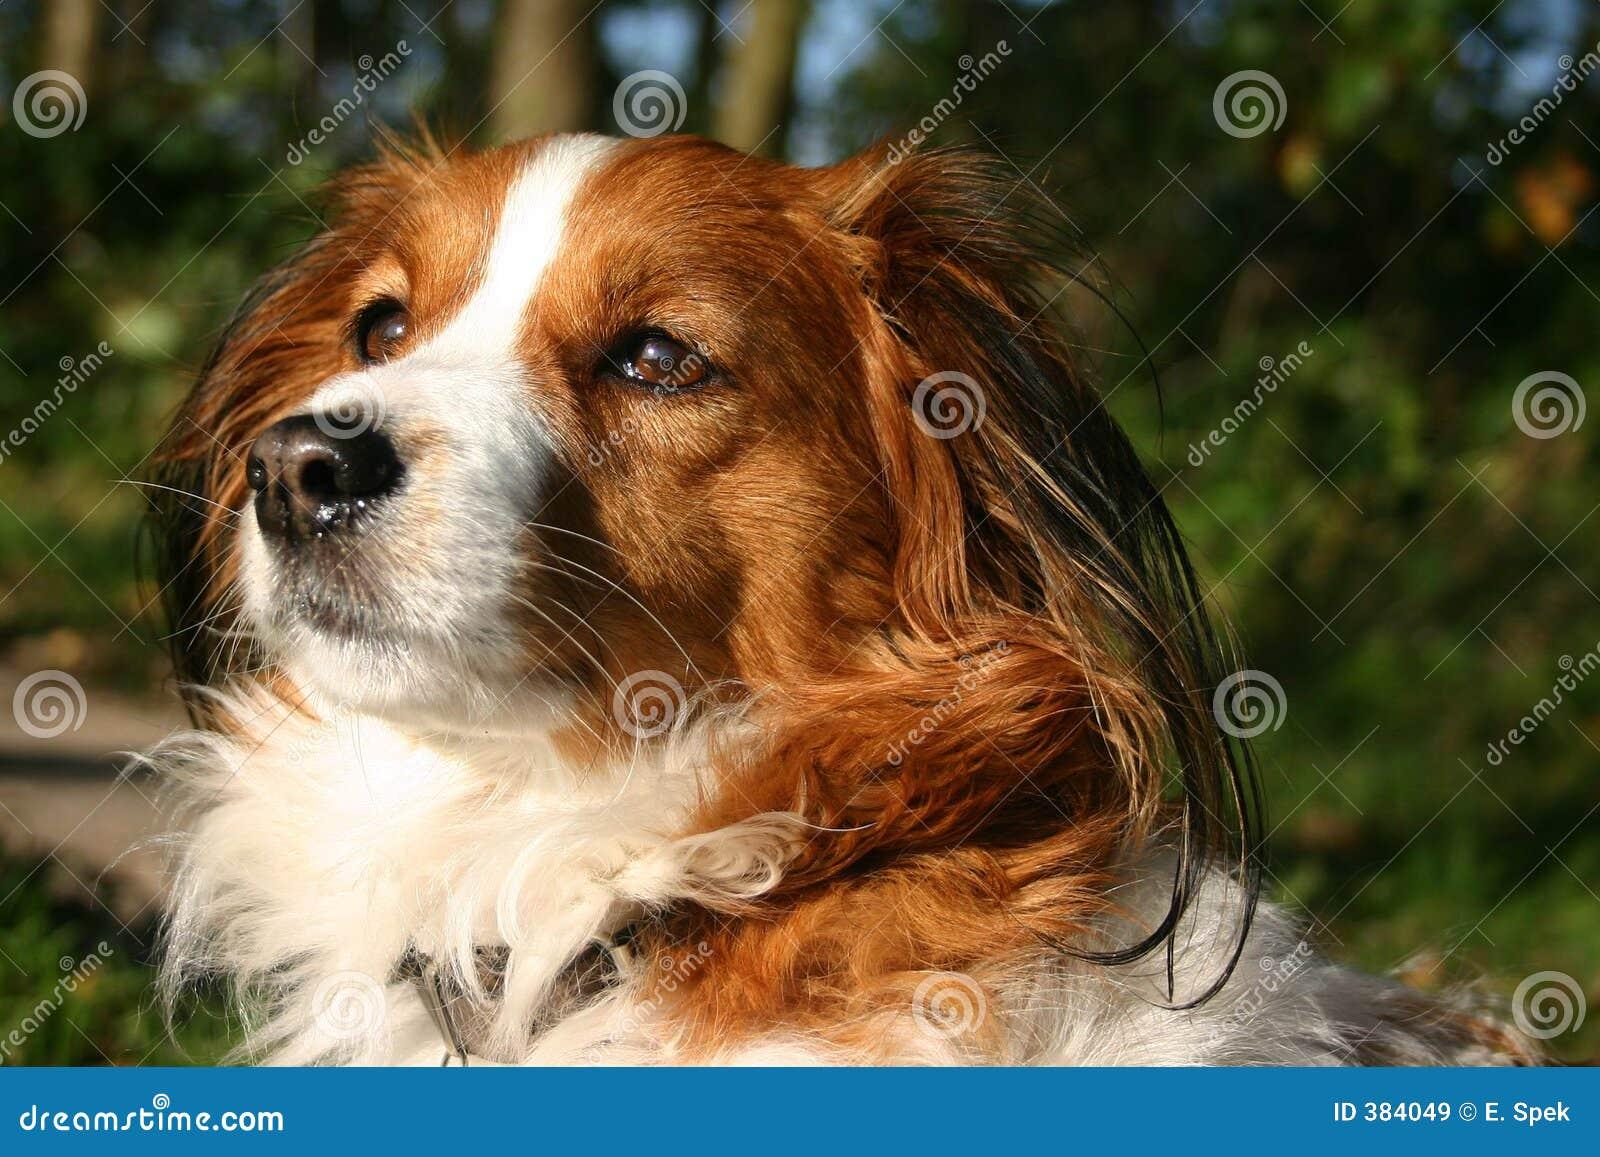 Cutest Dog Breed Ever